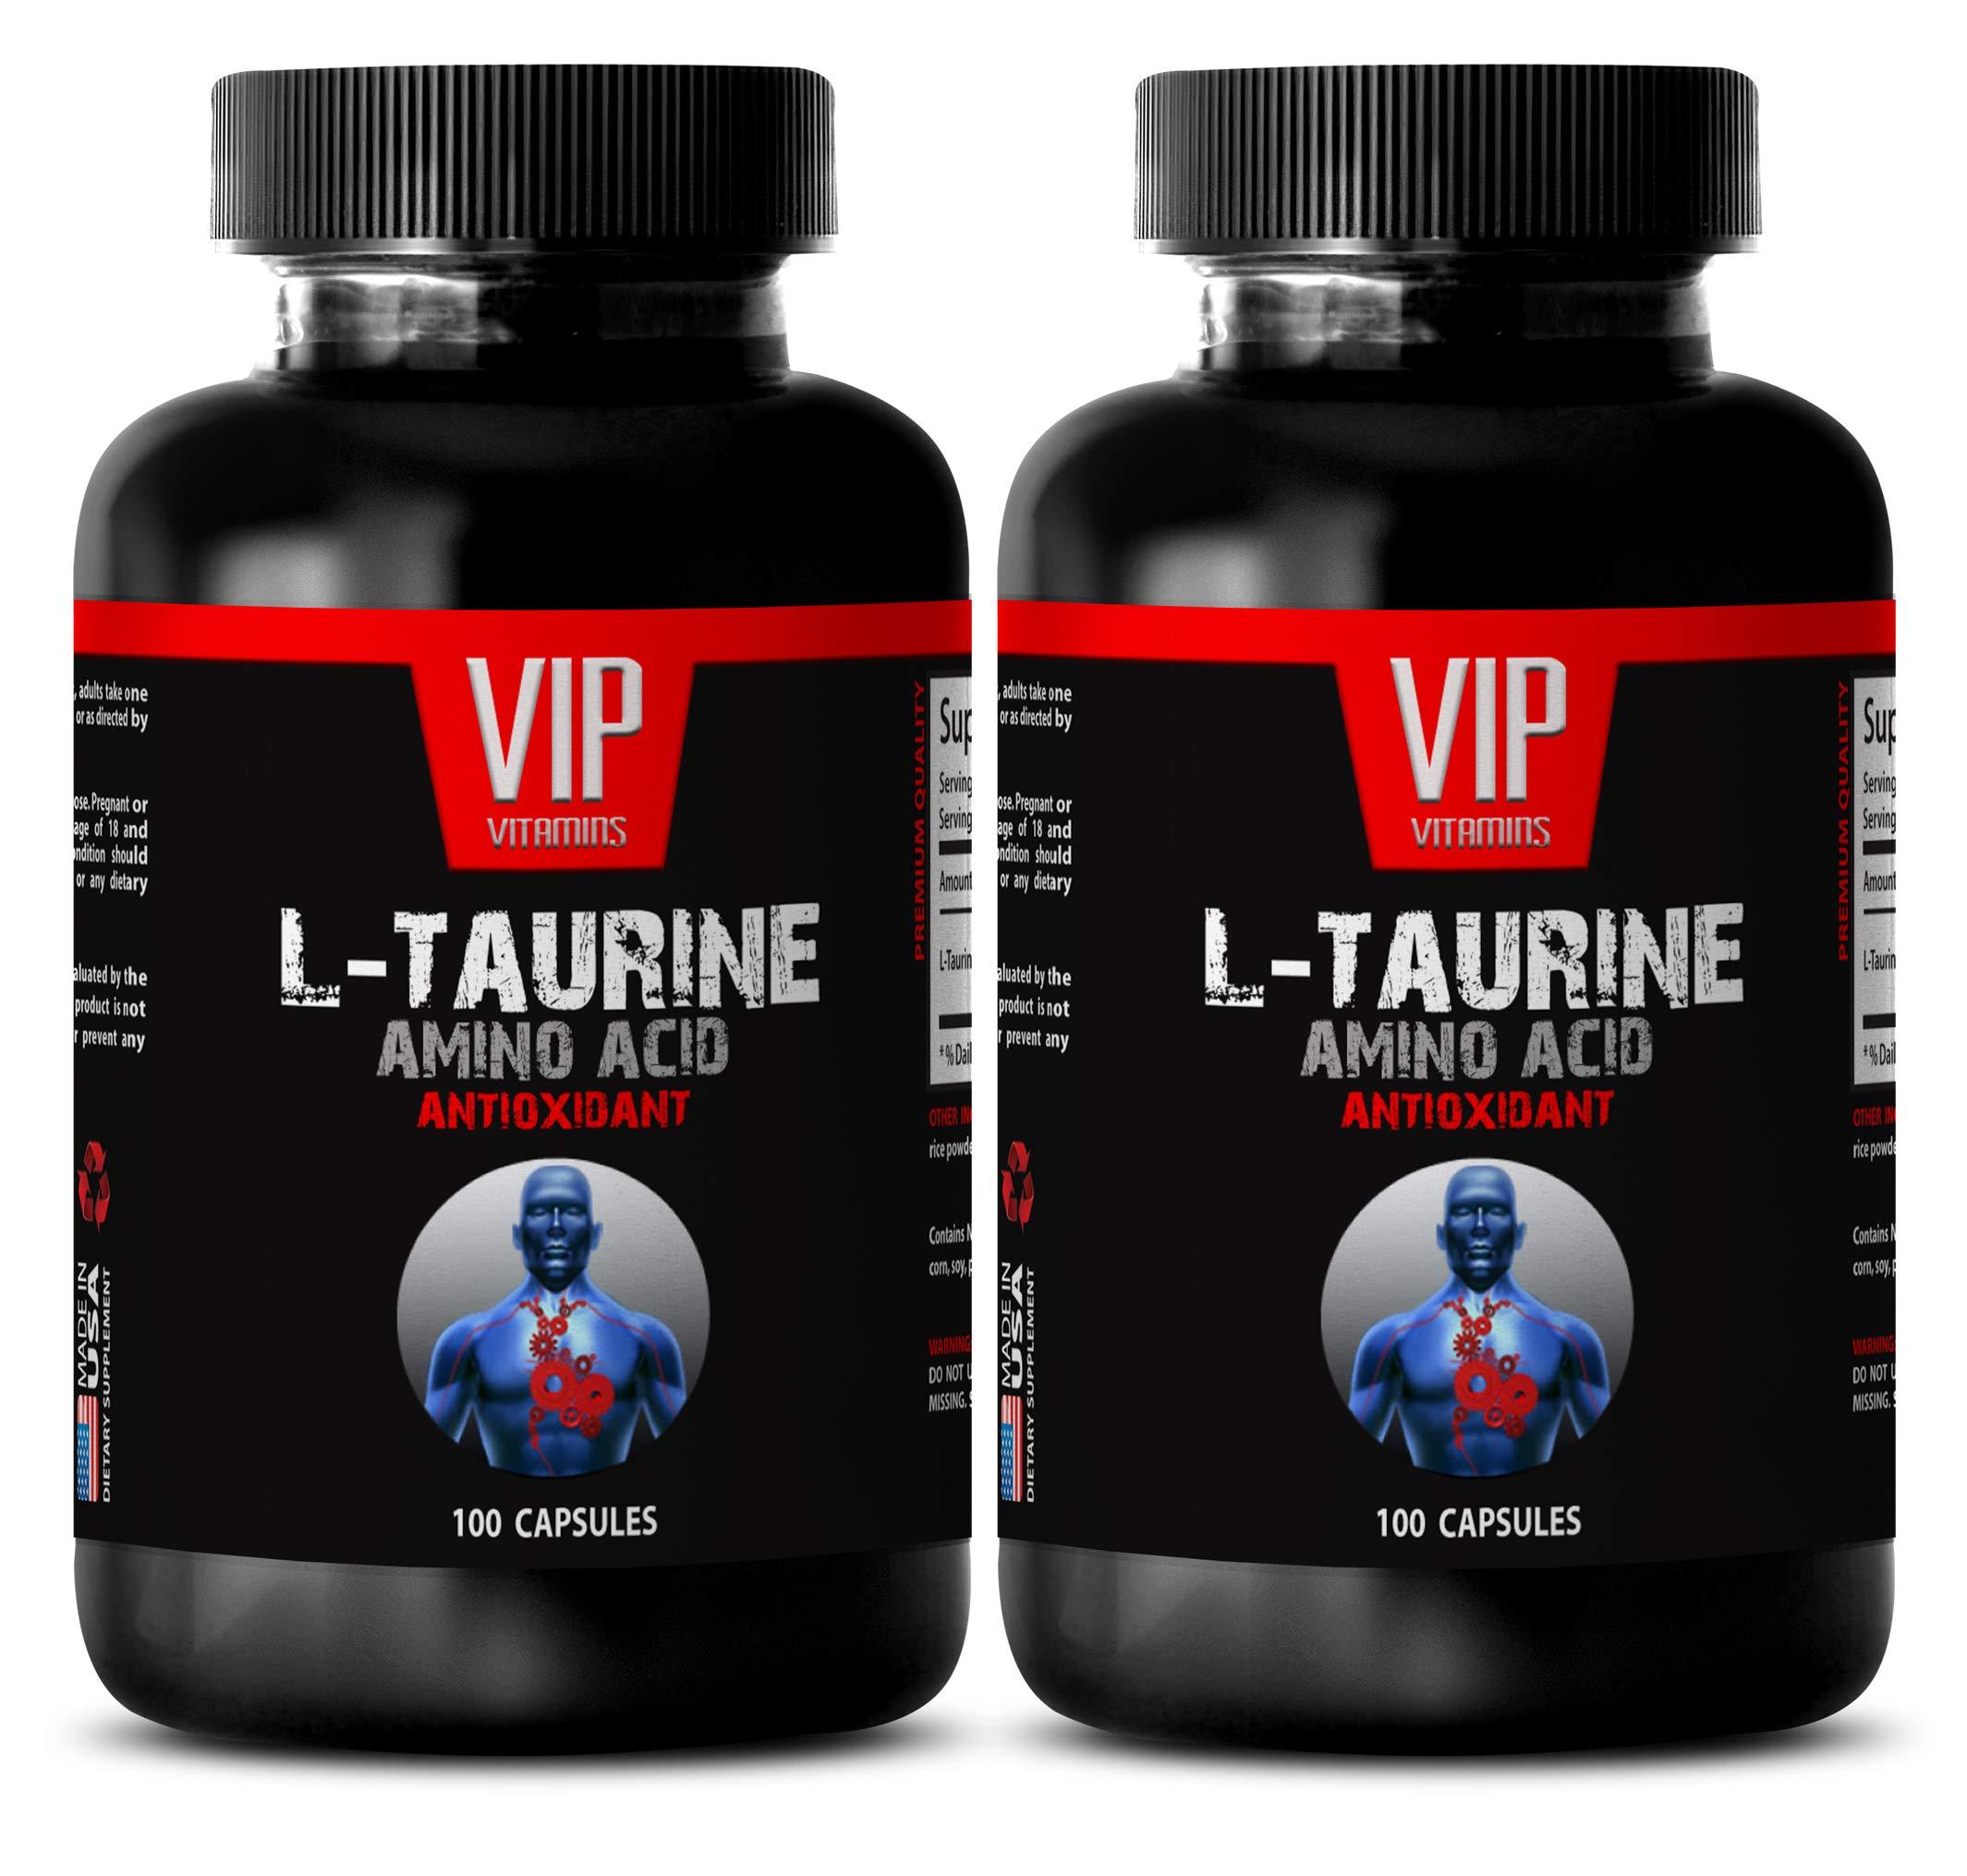 Anti inflammatory Supplement Capsules - L-Taurine 500MG - Amino Acid - ANTIOXIDANT - Taurine Bulk - 2 Bottles (200 Capsules)